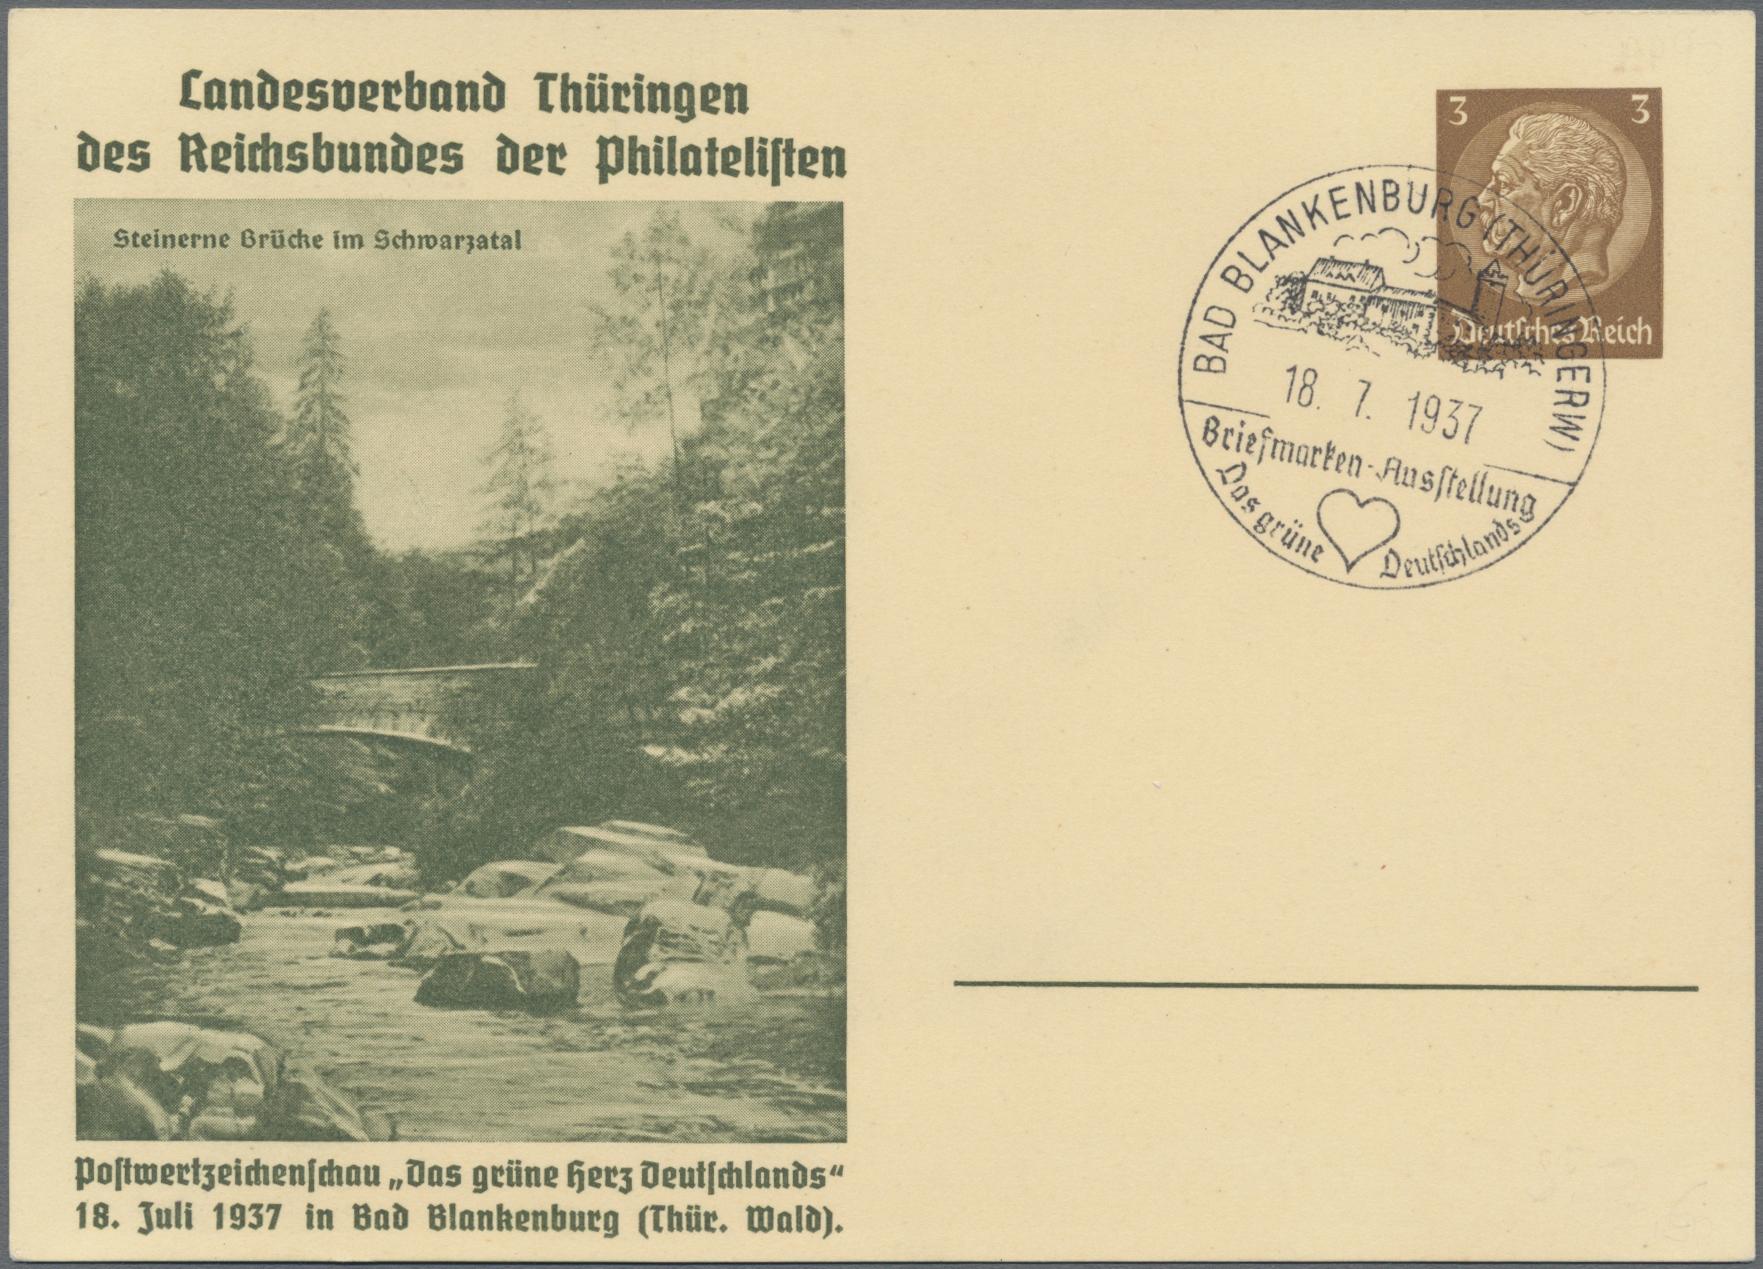 Lot 23551 - Deutsches Reich - Privatganzsachen  -  Auktionshaus Christoph Gärtner GmbH & Co. KG Sale #49 Collections Overseas, Thematics, Europe, Germany/Estates